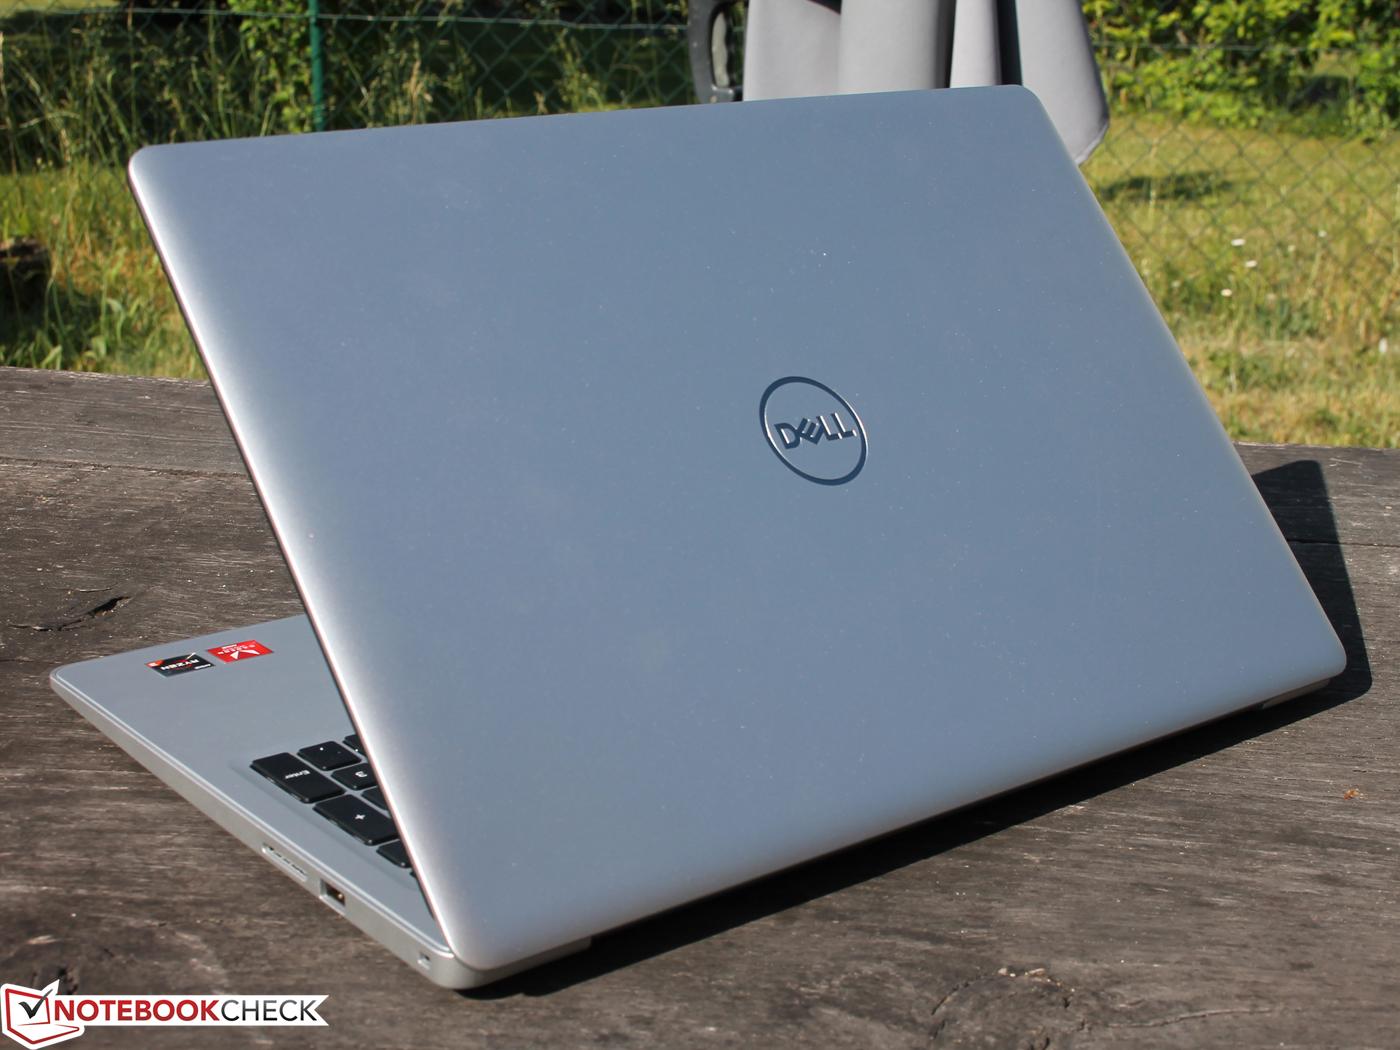 Test Dell Inspiron 15 5575 Ryzen 3 2200u Vega Laptop 20 3064 Touch